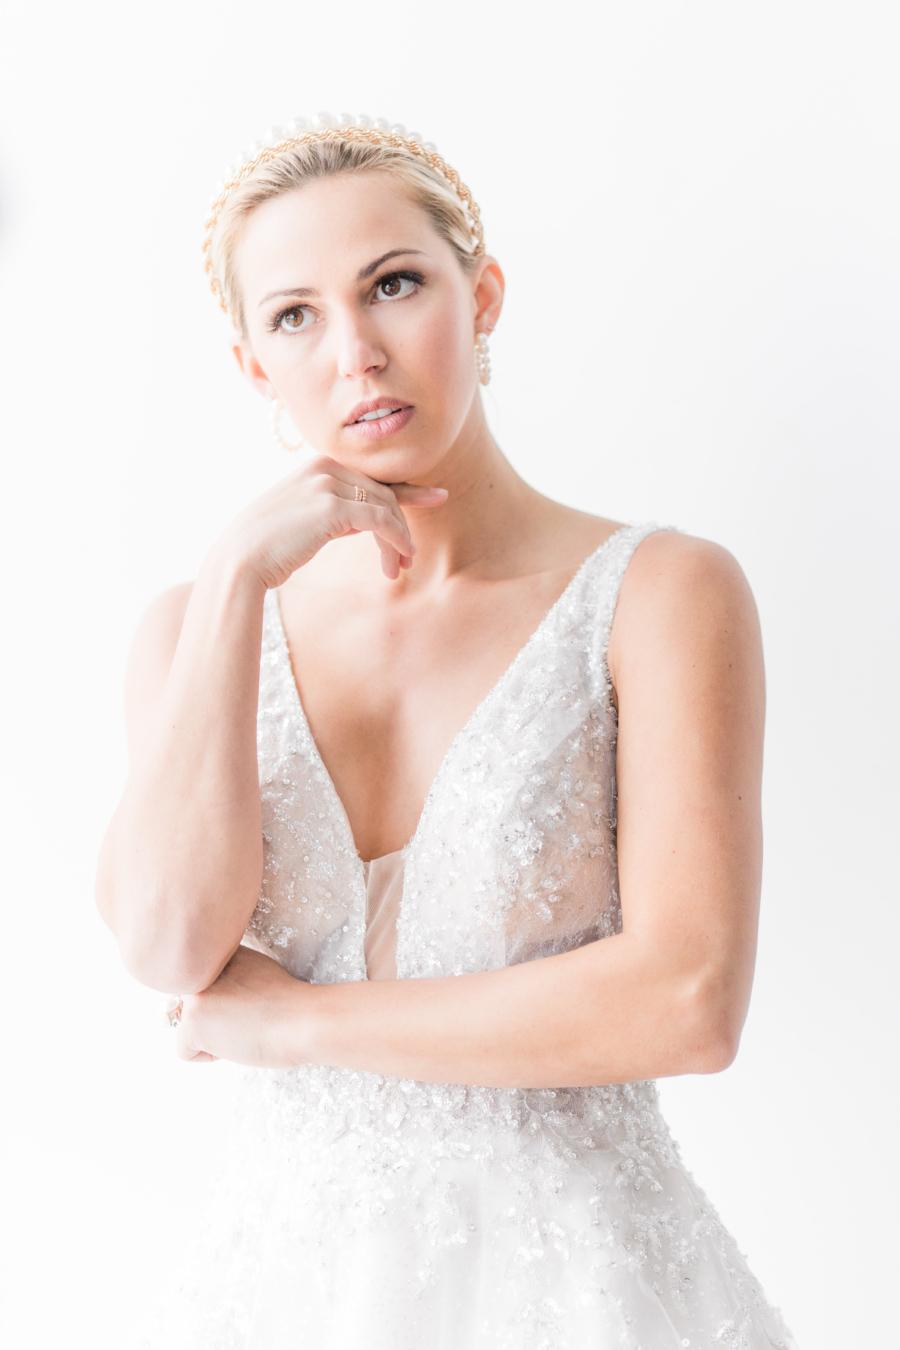 Bridal portrait by Allyography